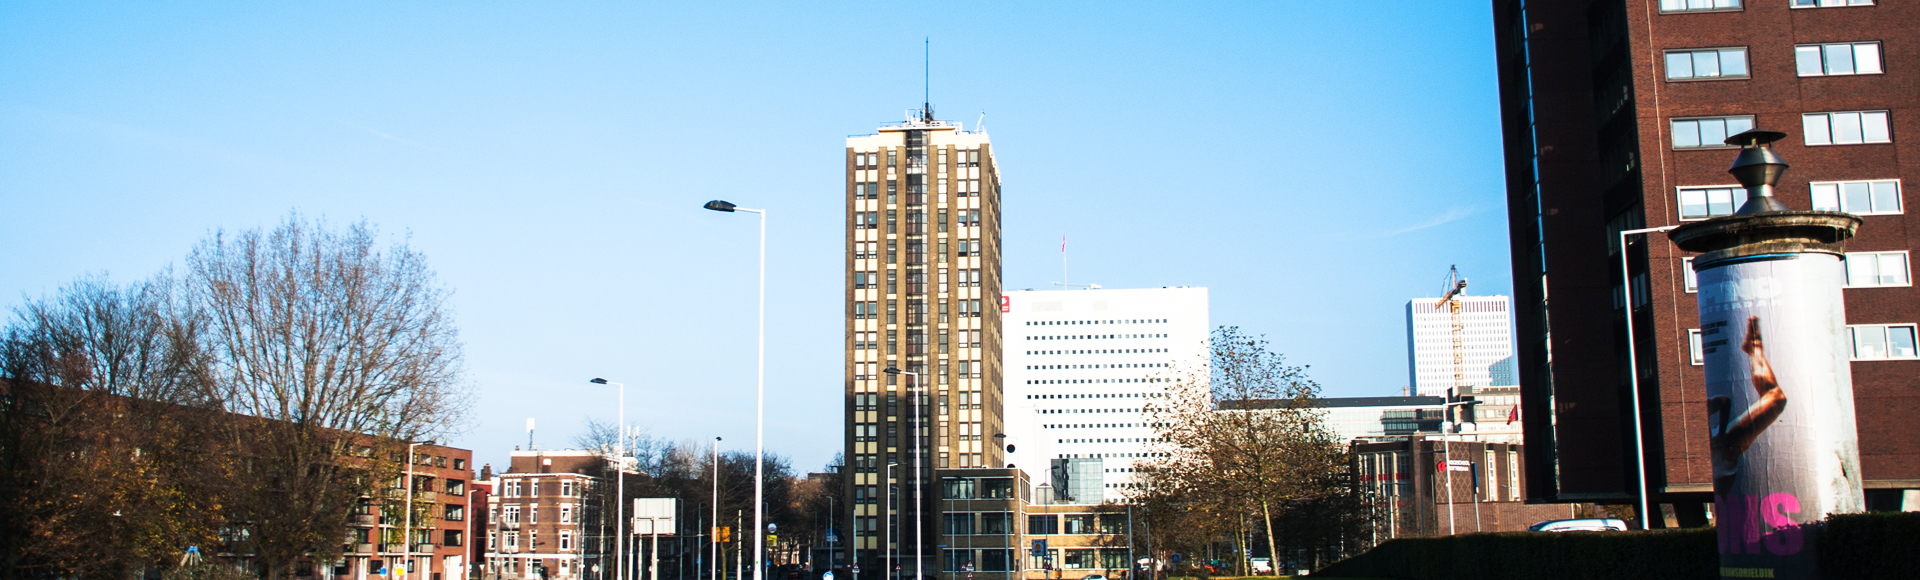 GEB-toren